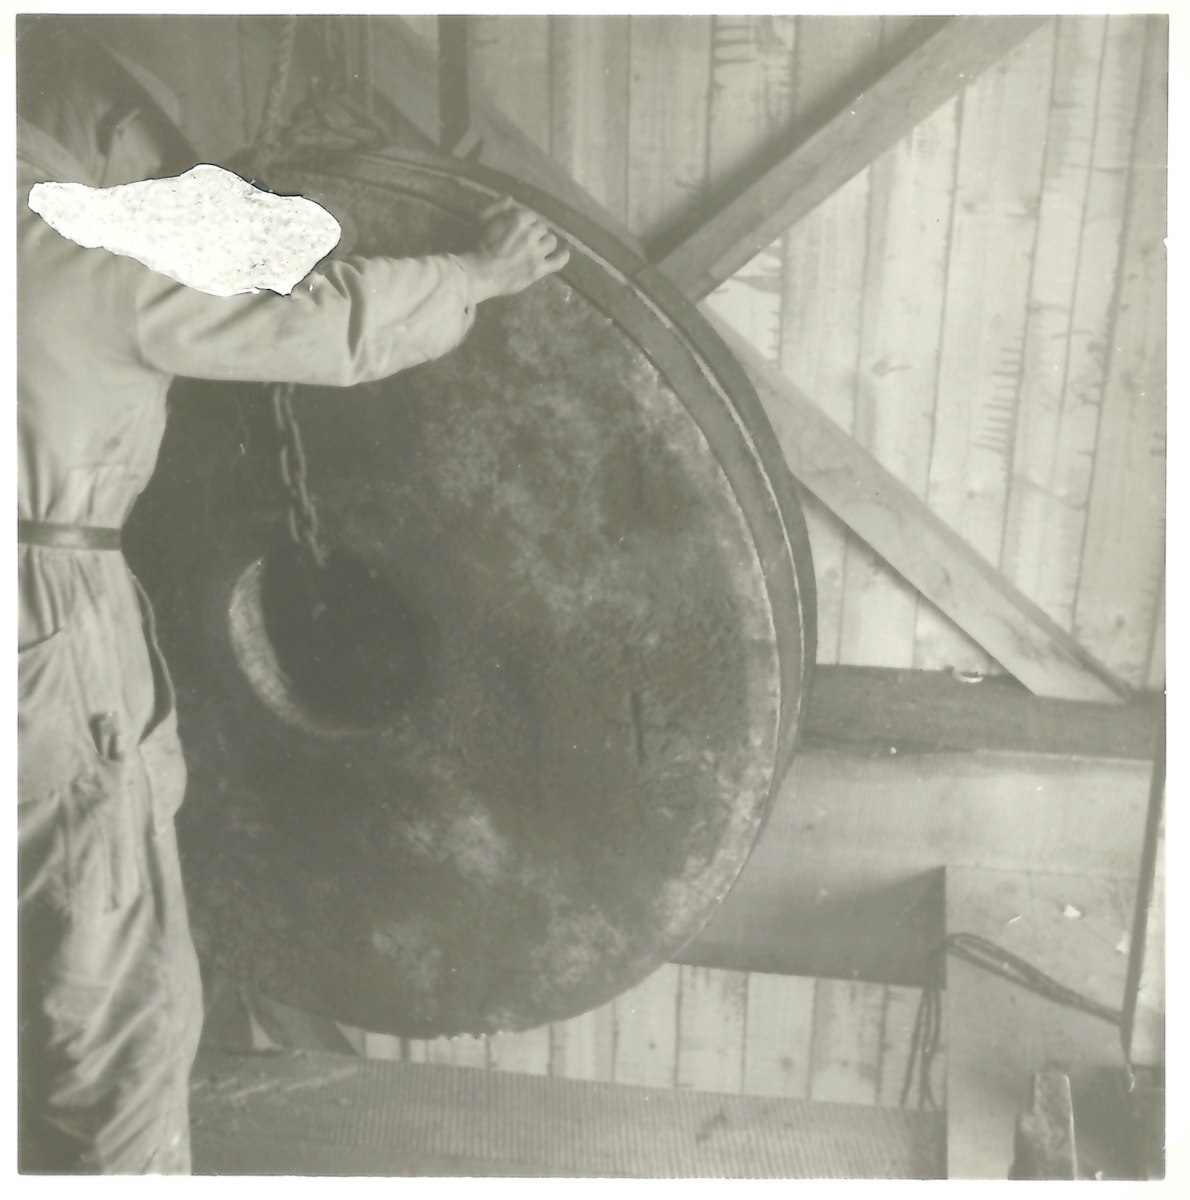 0007-12-10-1964